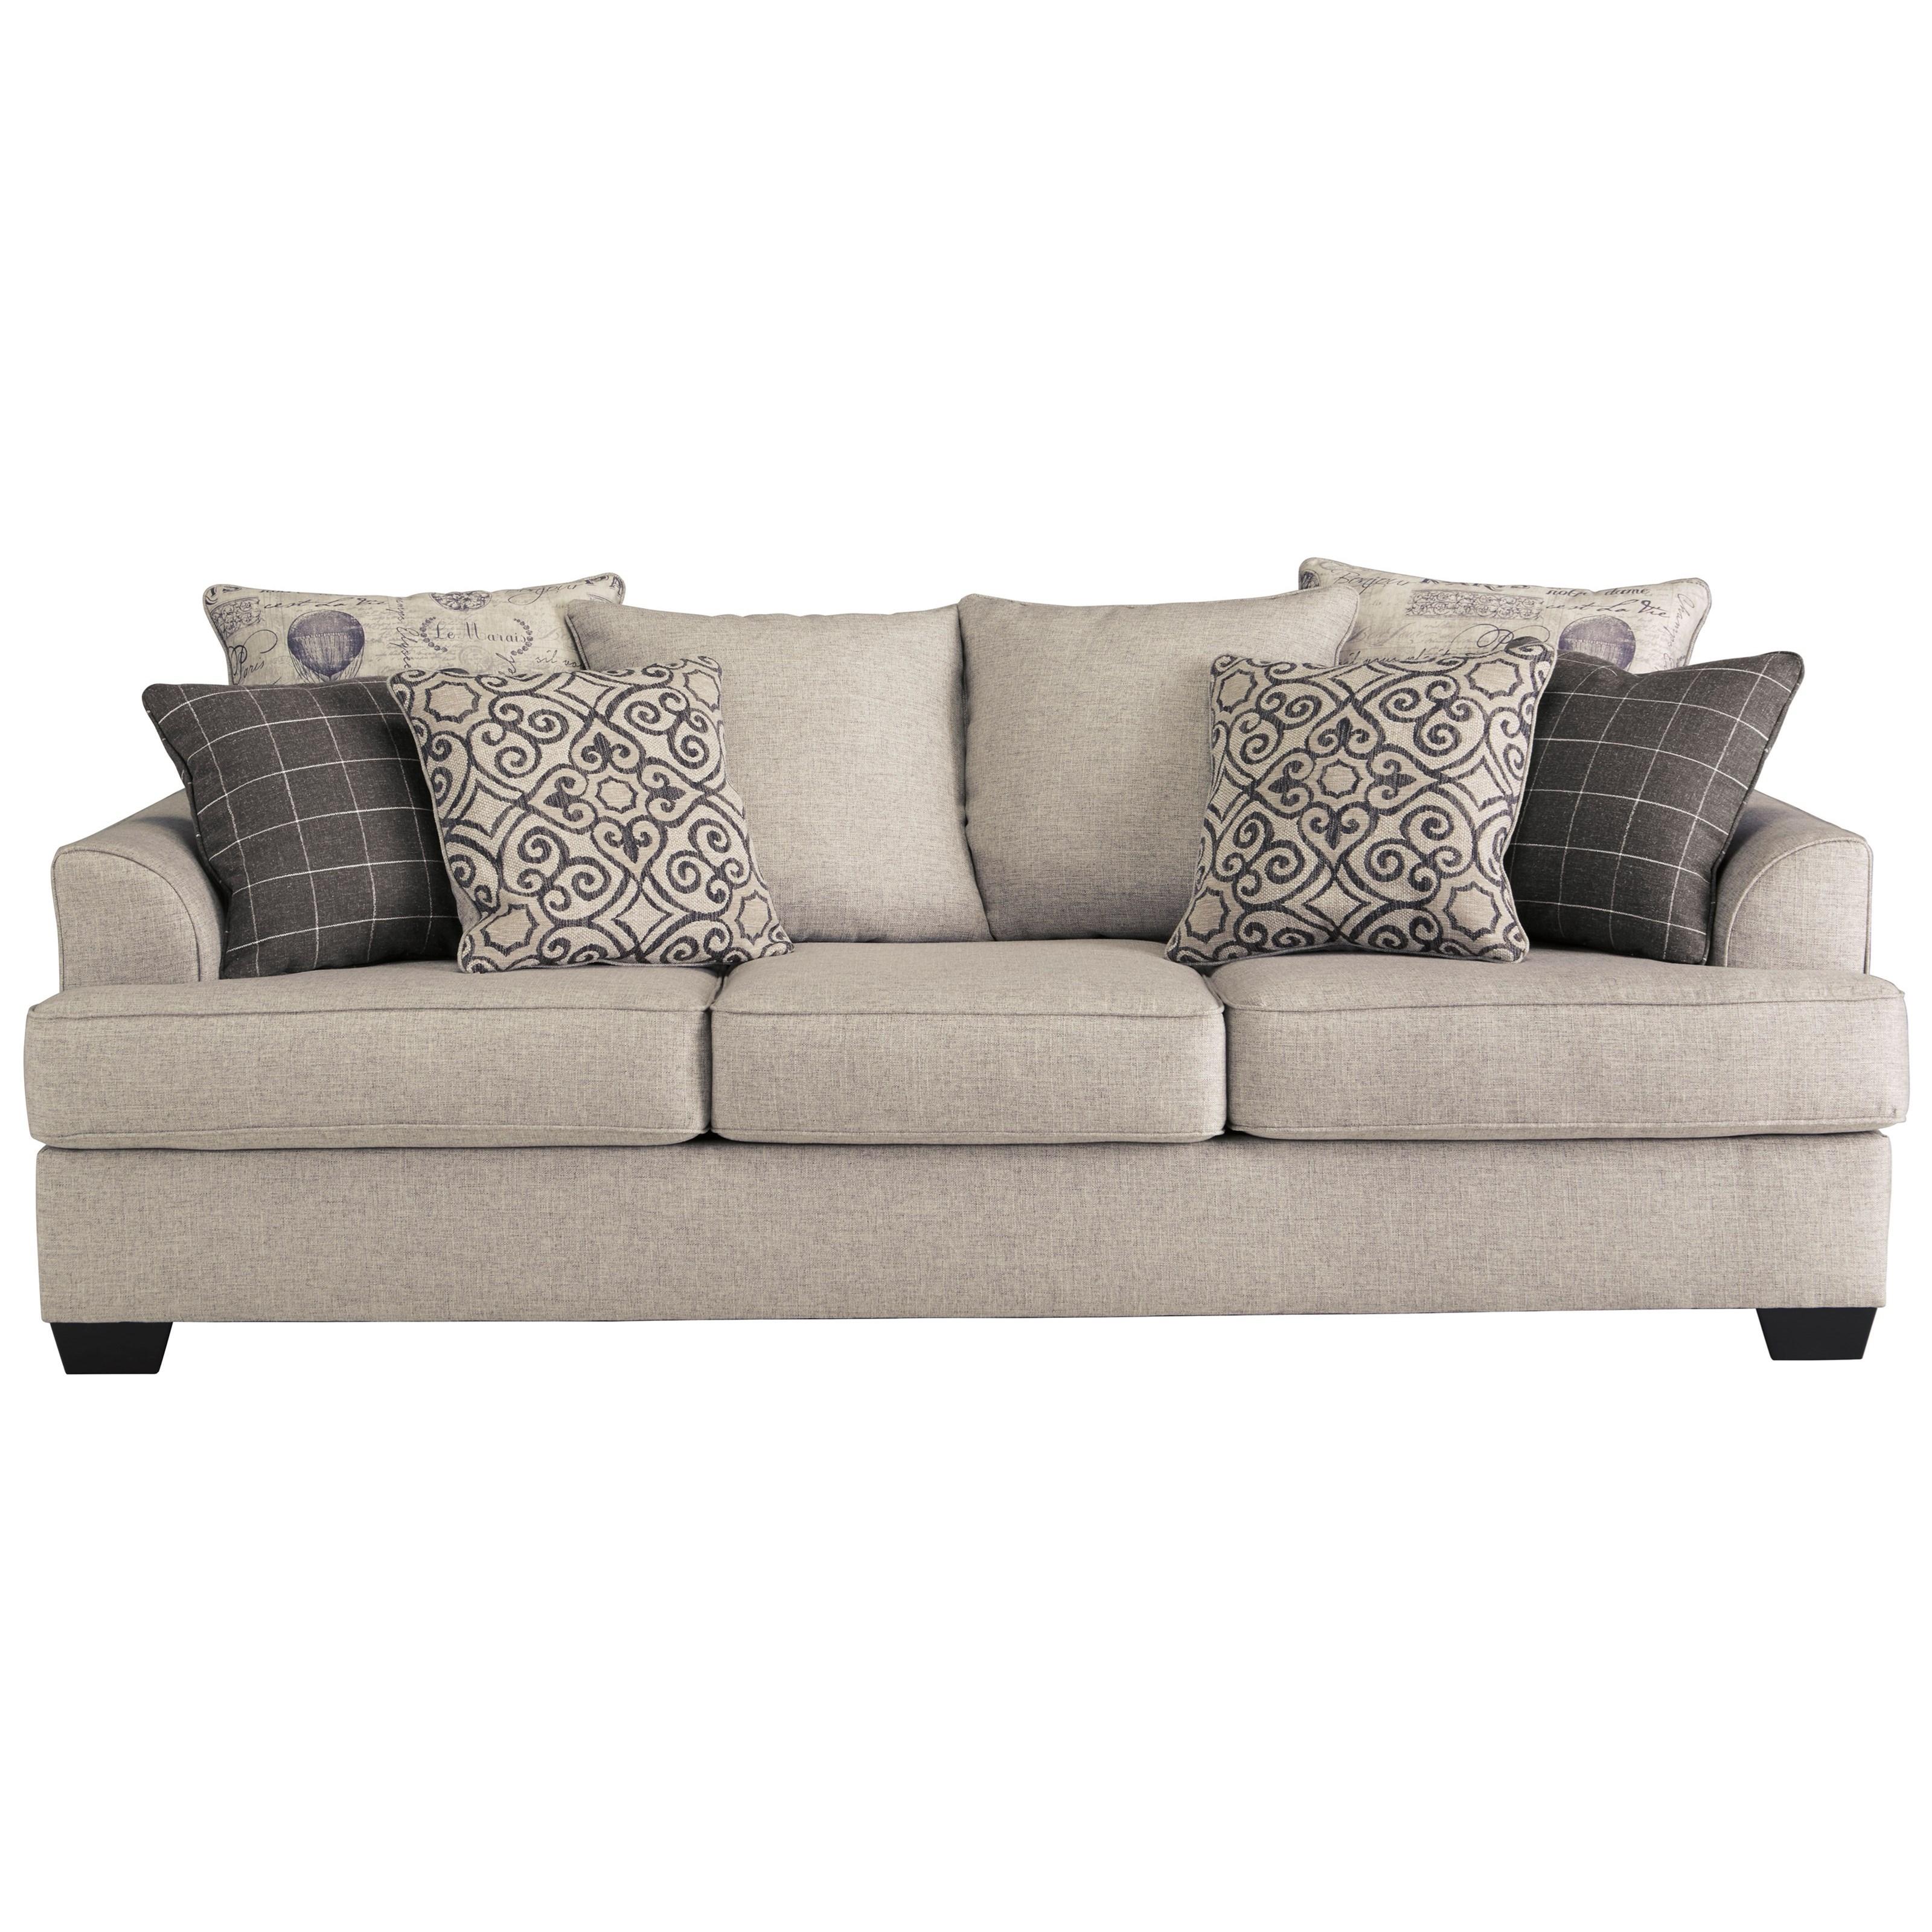 Velletri Sofa by Signature Design by Ashley at Suburban Furniture